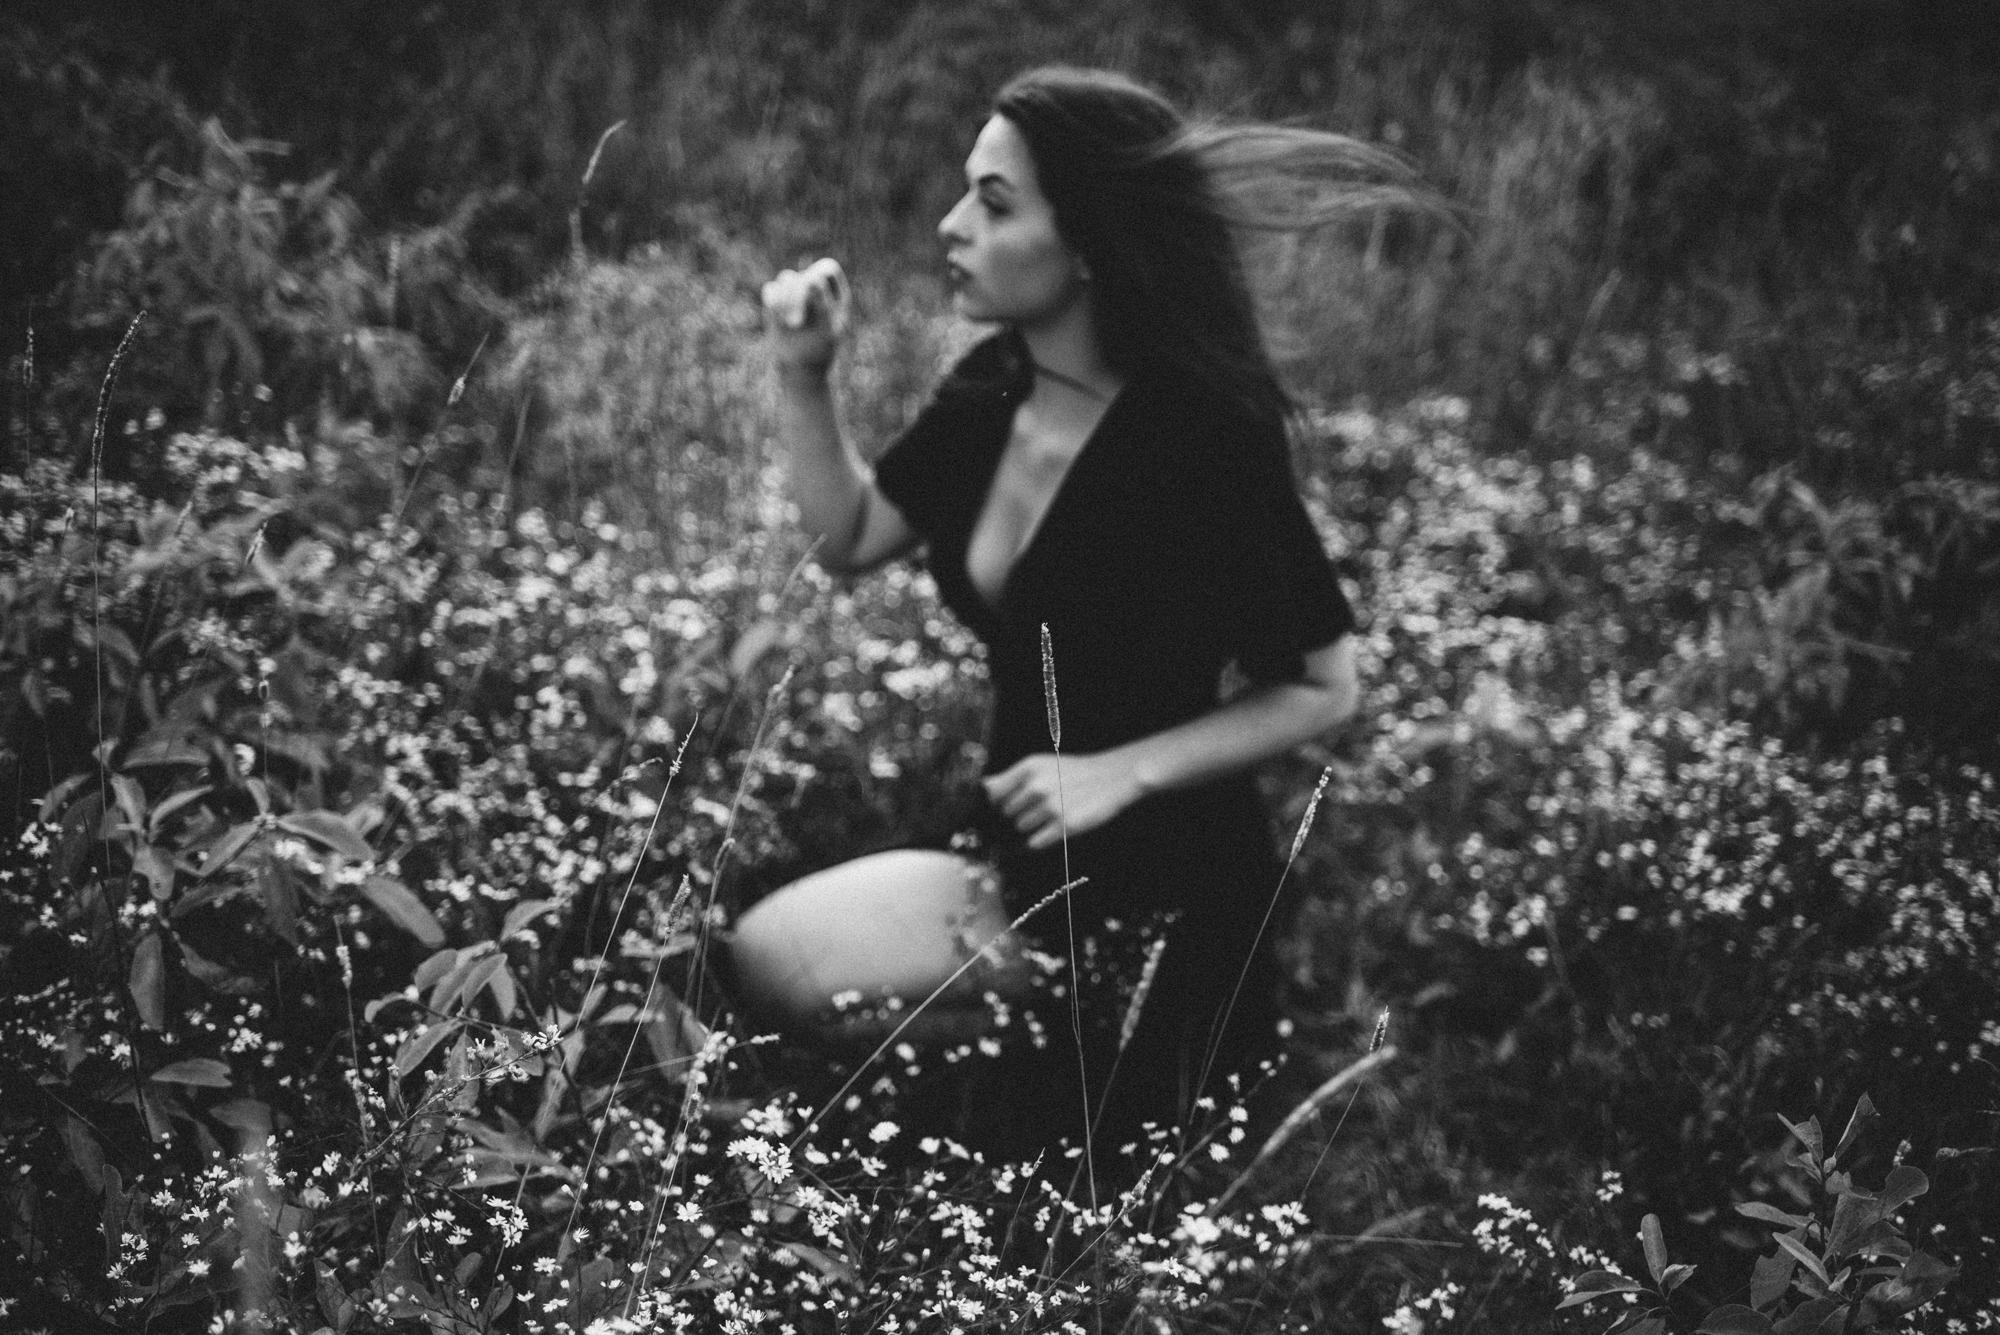 Megan_Shenandoah_National_Park_Windy_Romantic_Portraits_149.JPG